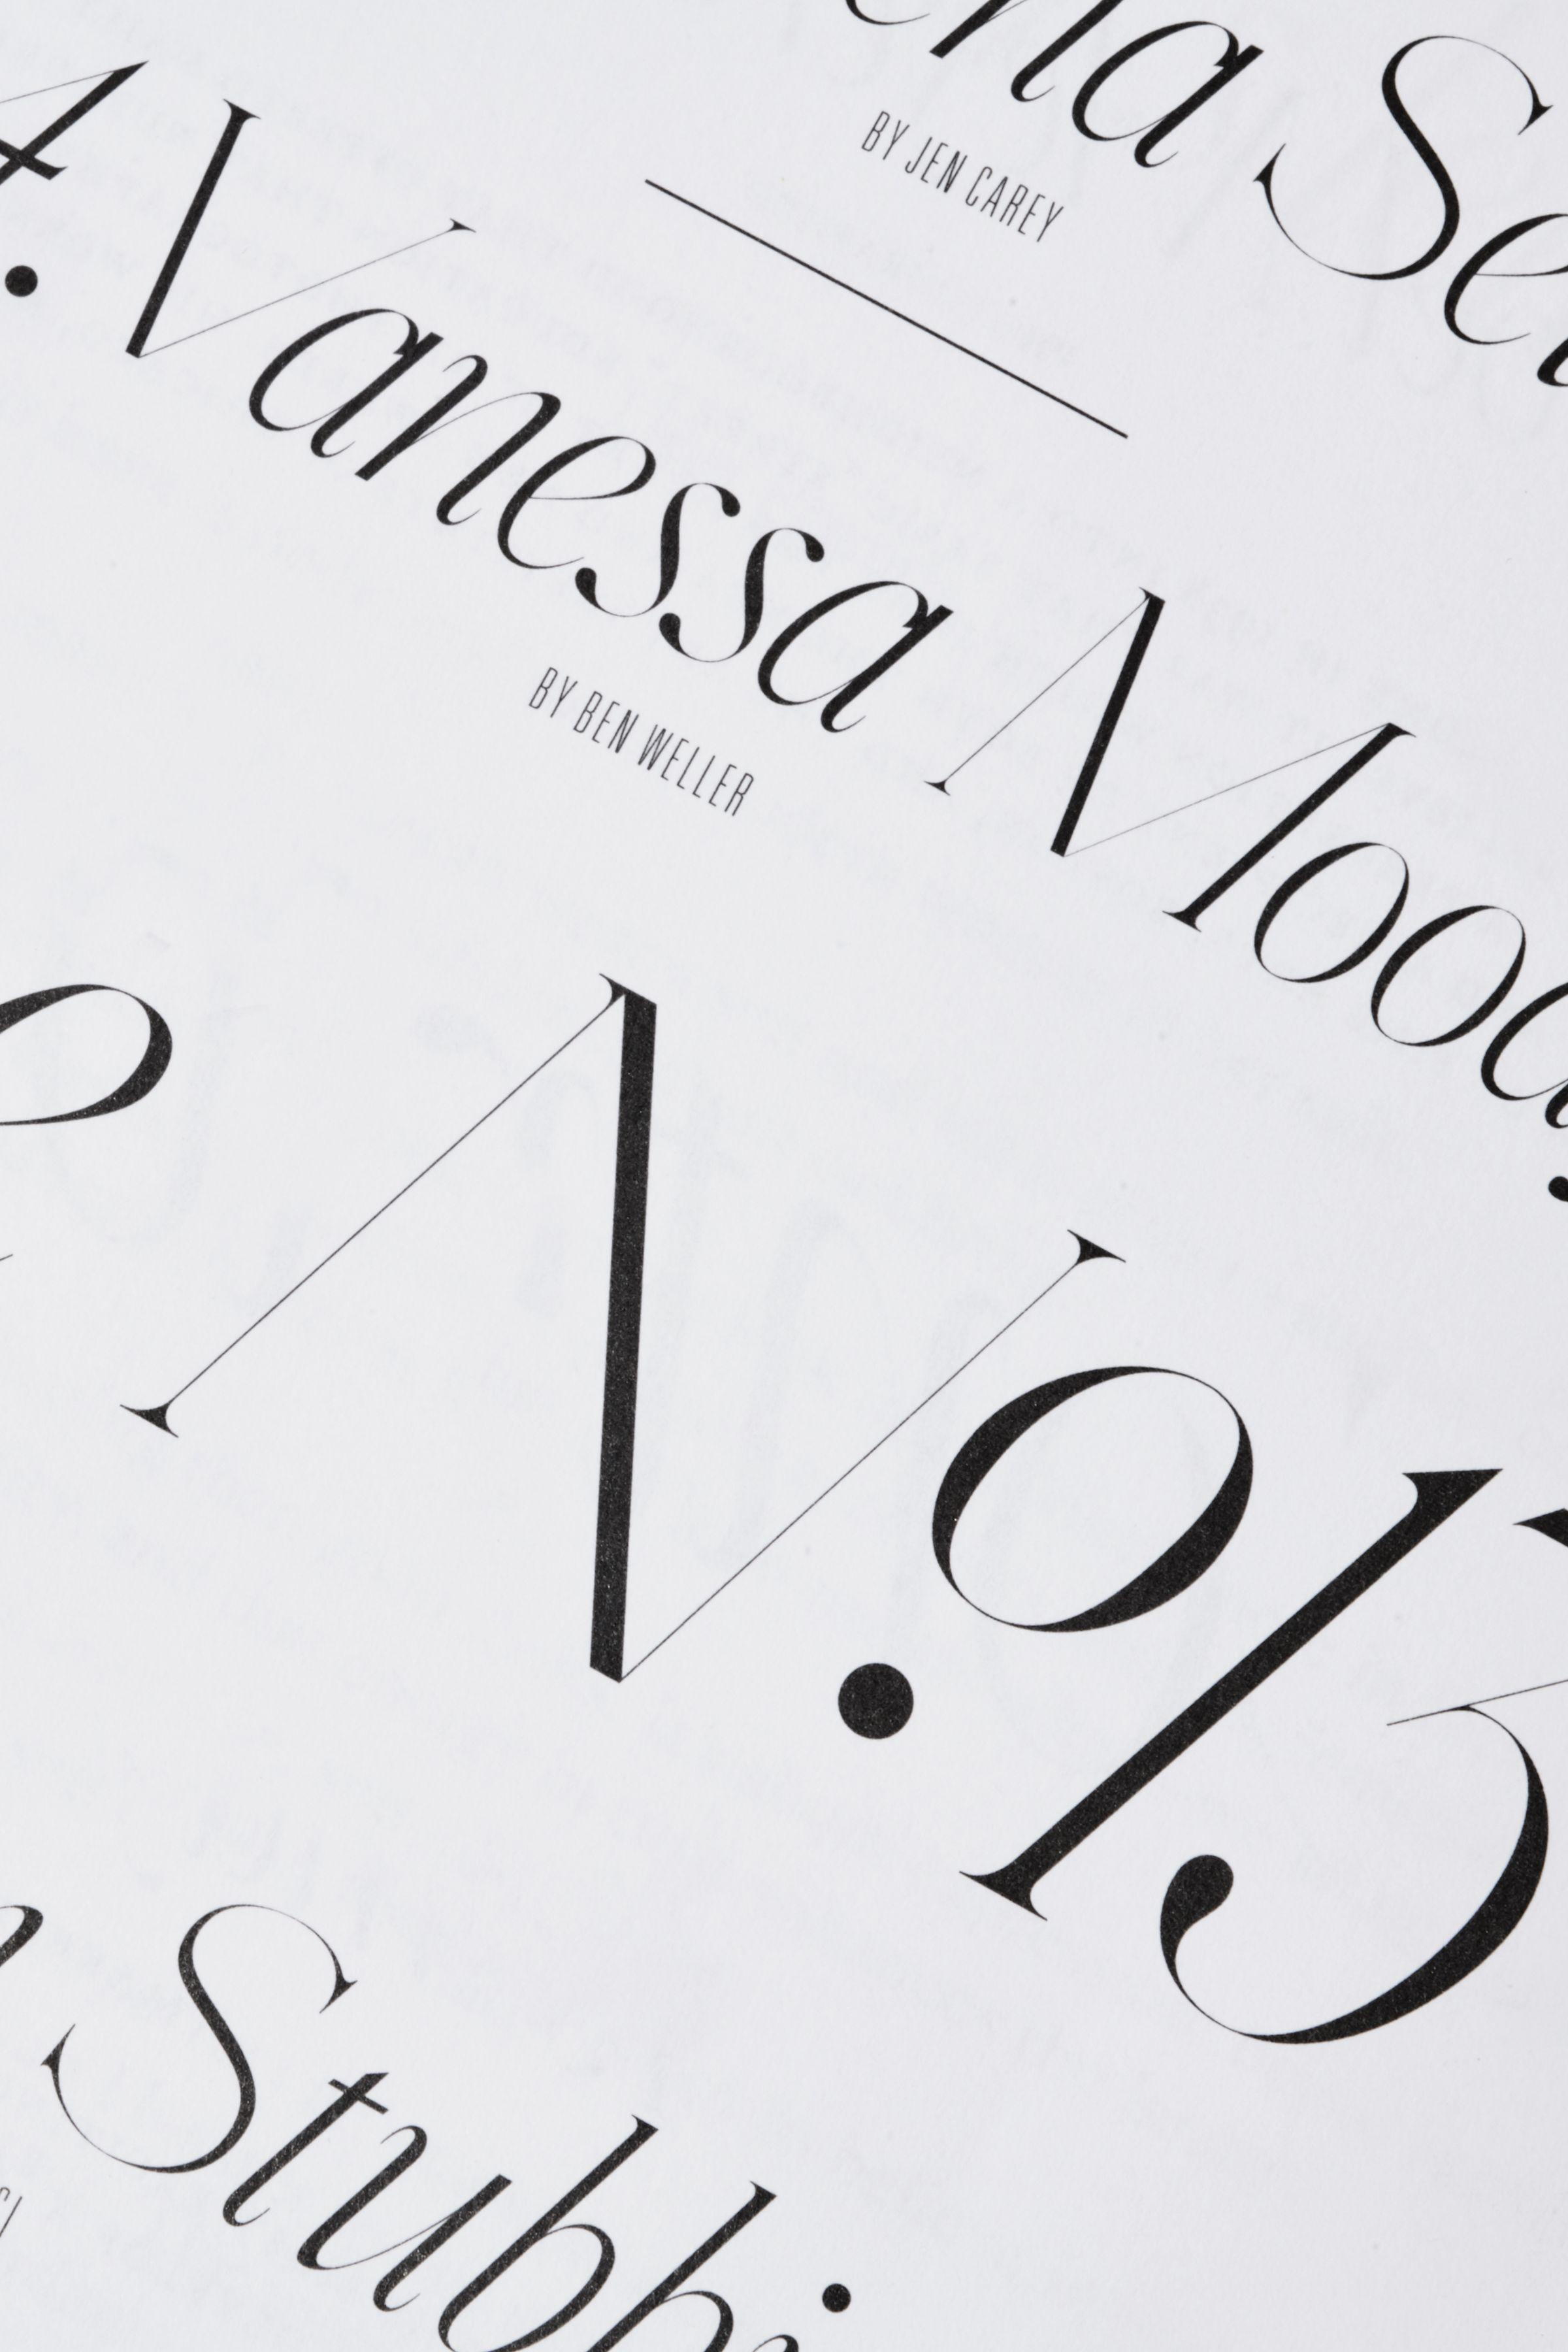 Rika Magazine issue no. 13 custom typeface design